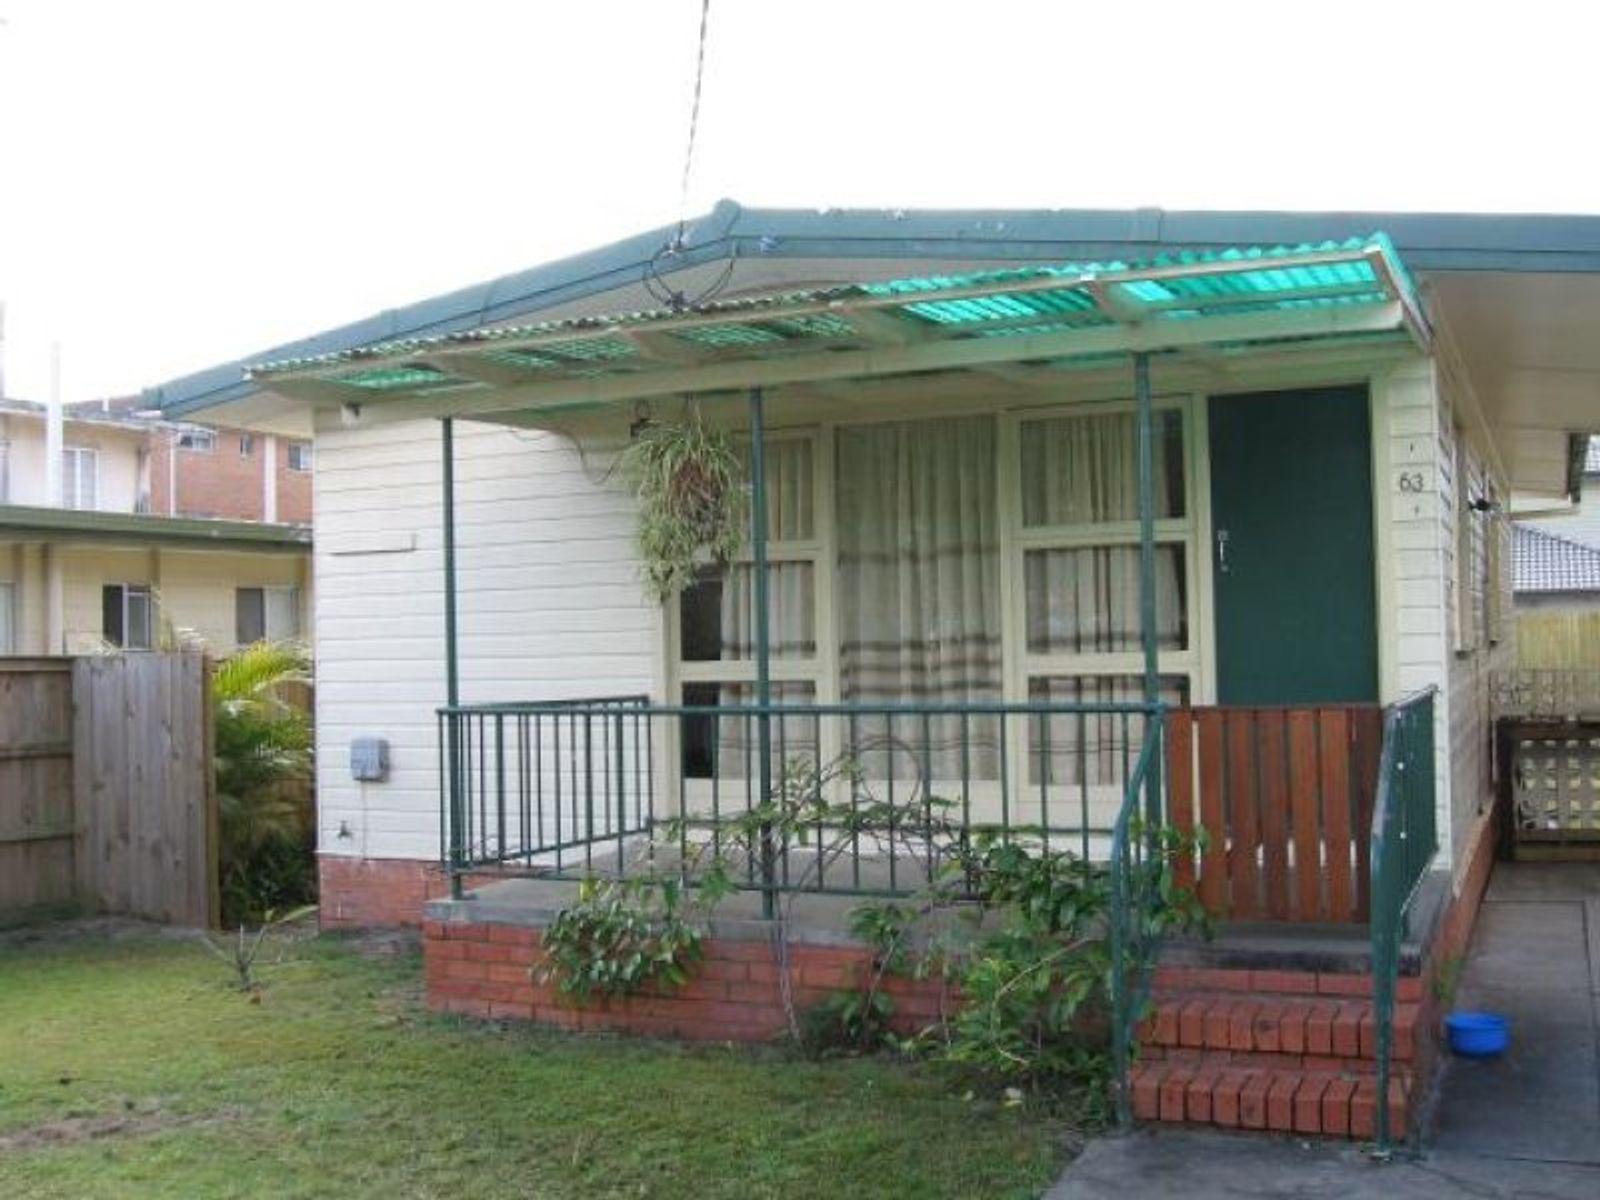 63 Petrel Avenue, Mermaid Beach, QLD 4218